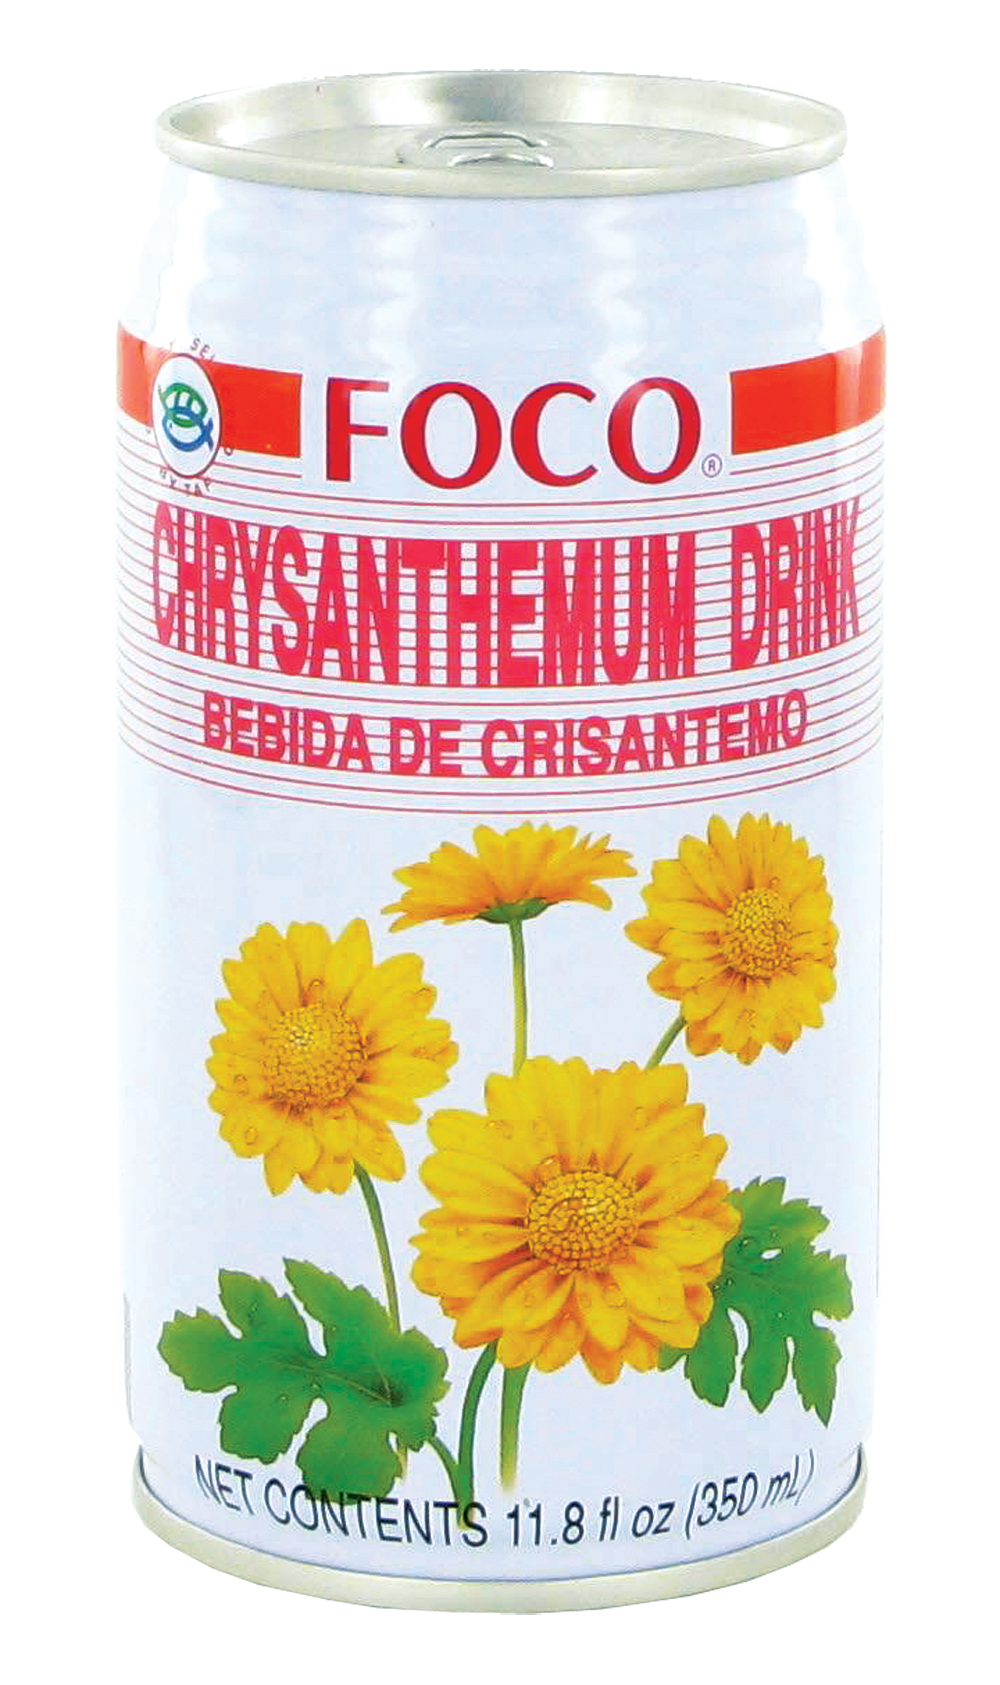 Boisson au chrysanthème, Foco (35 cl)